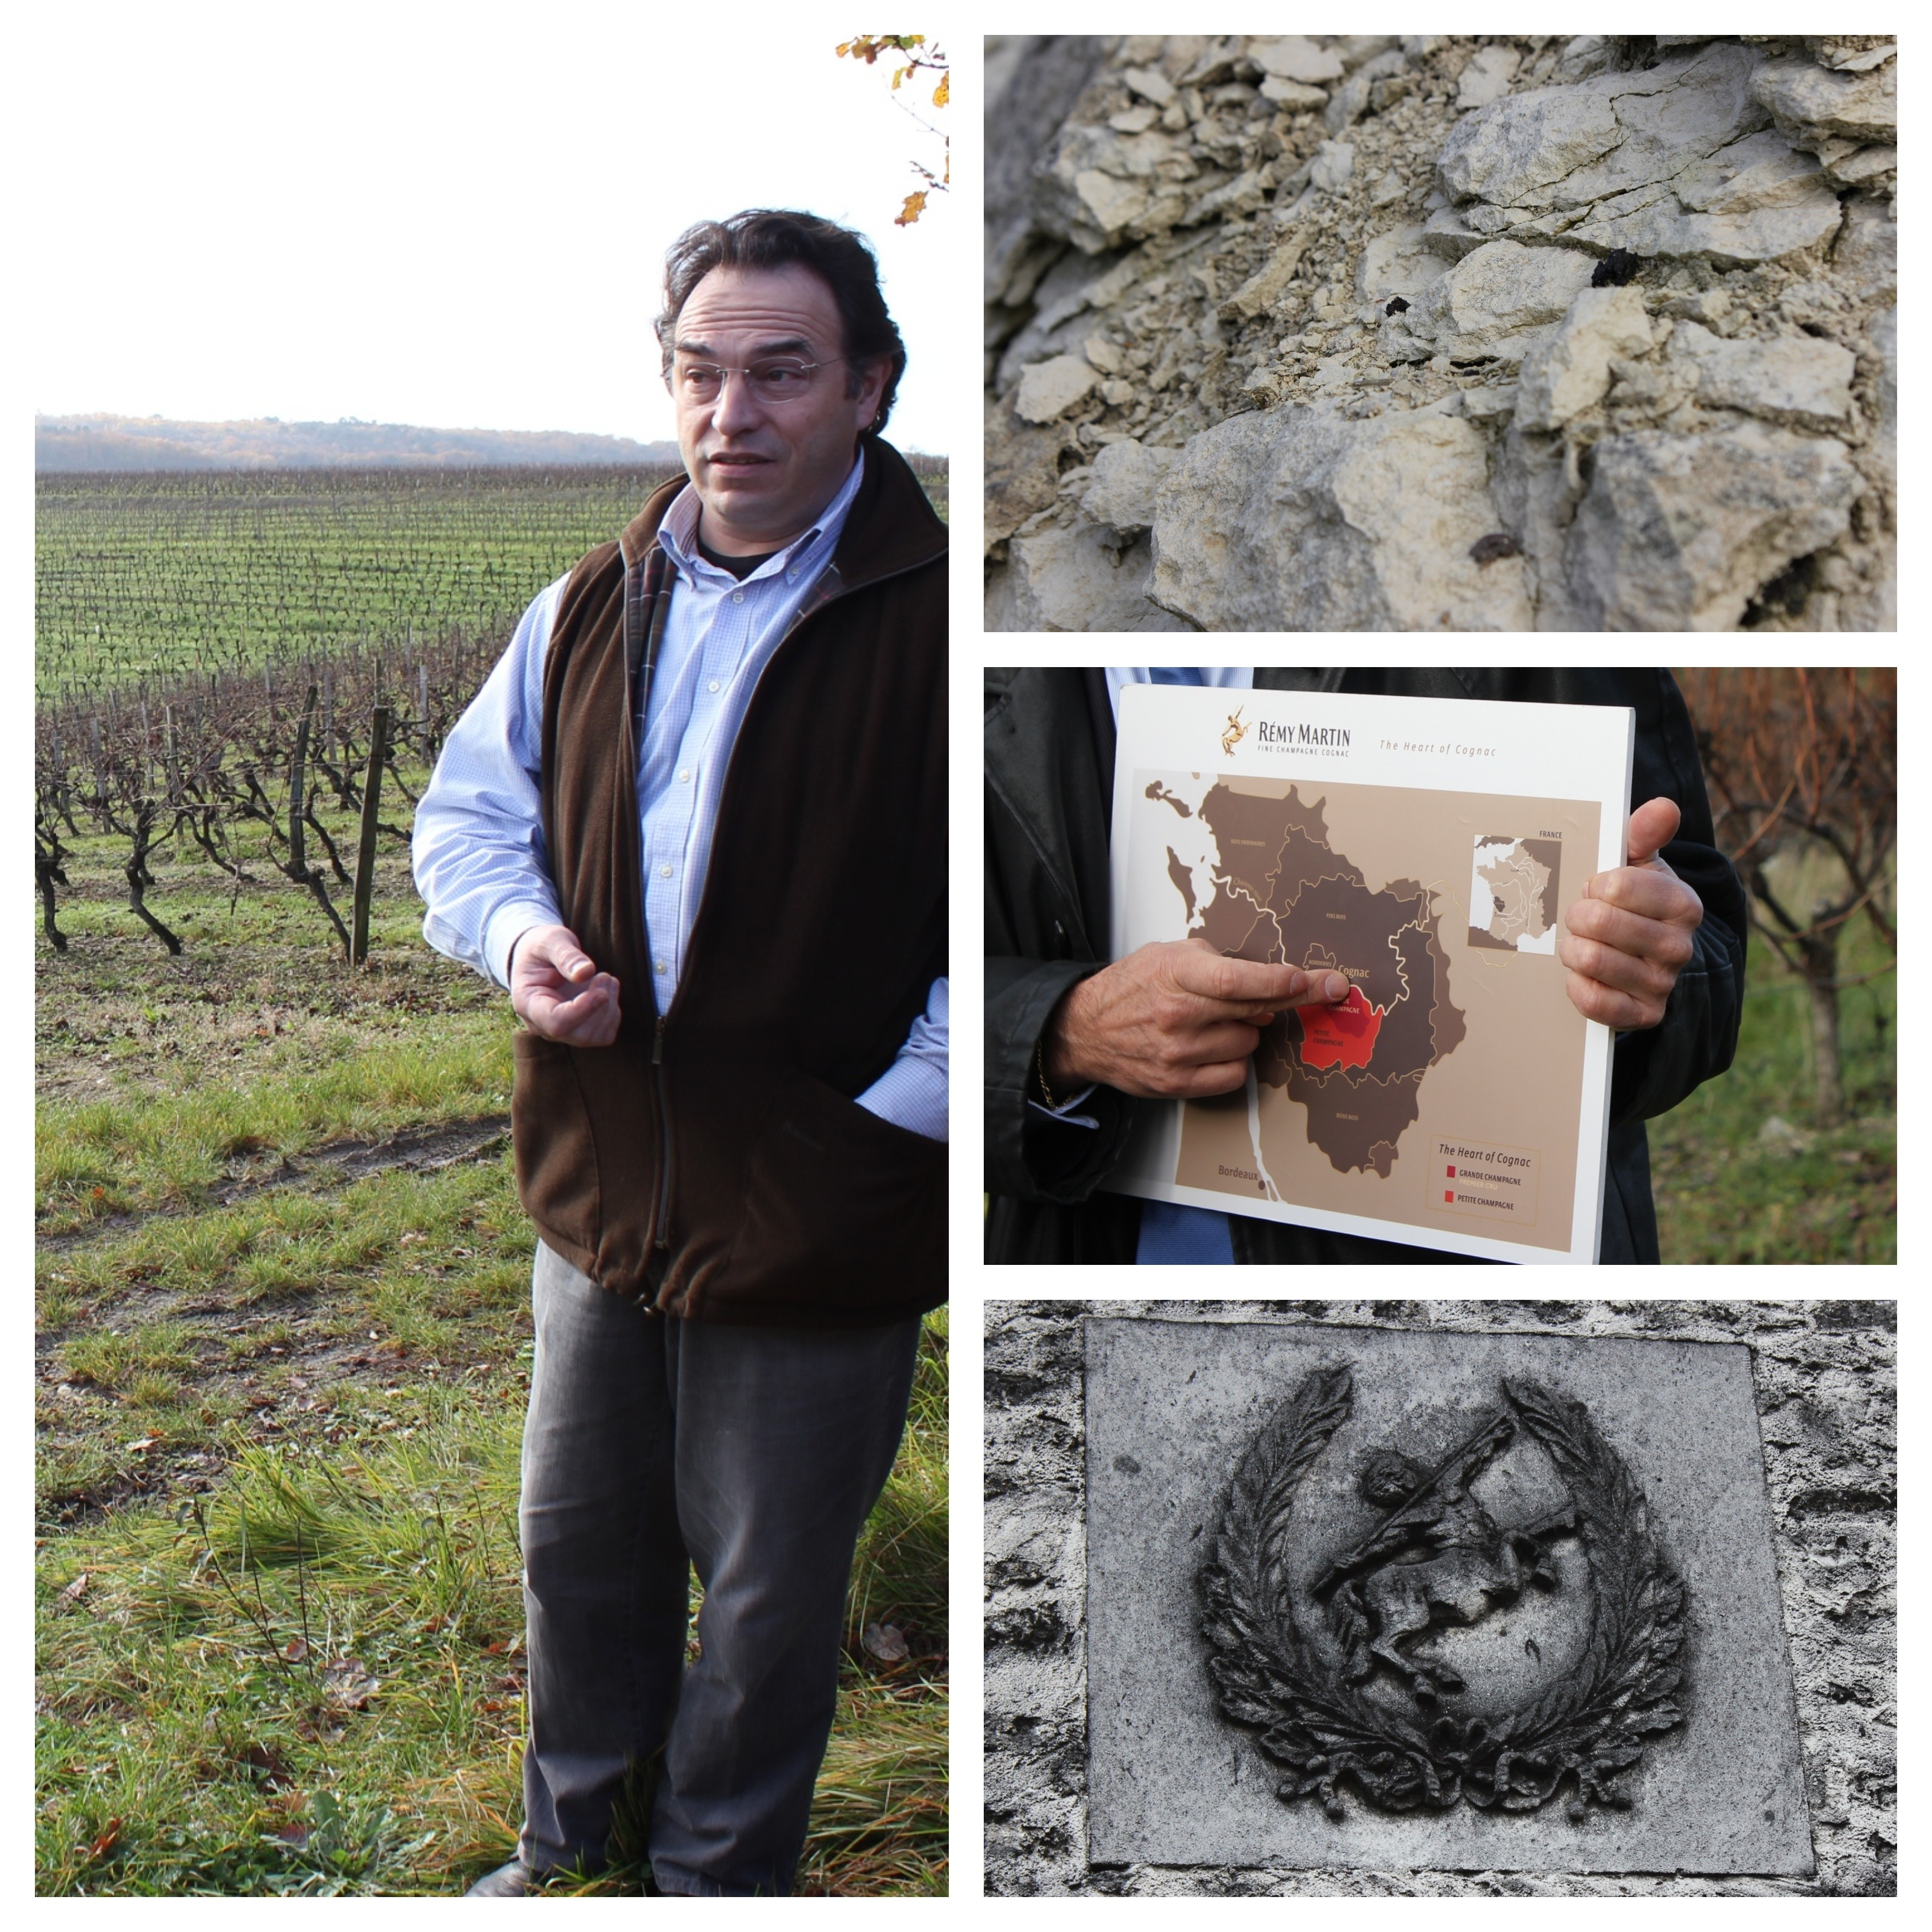 The 'terroir' & meeting a winegrower partner